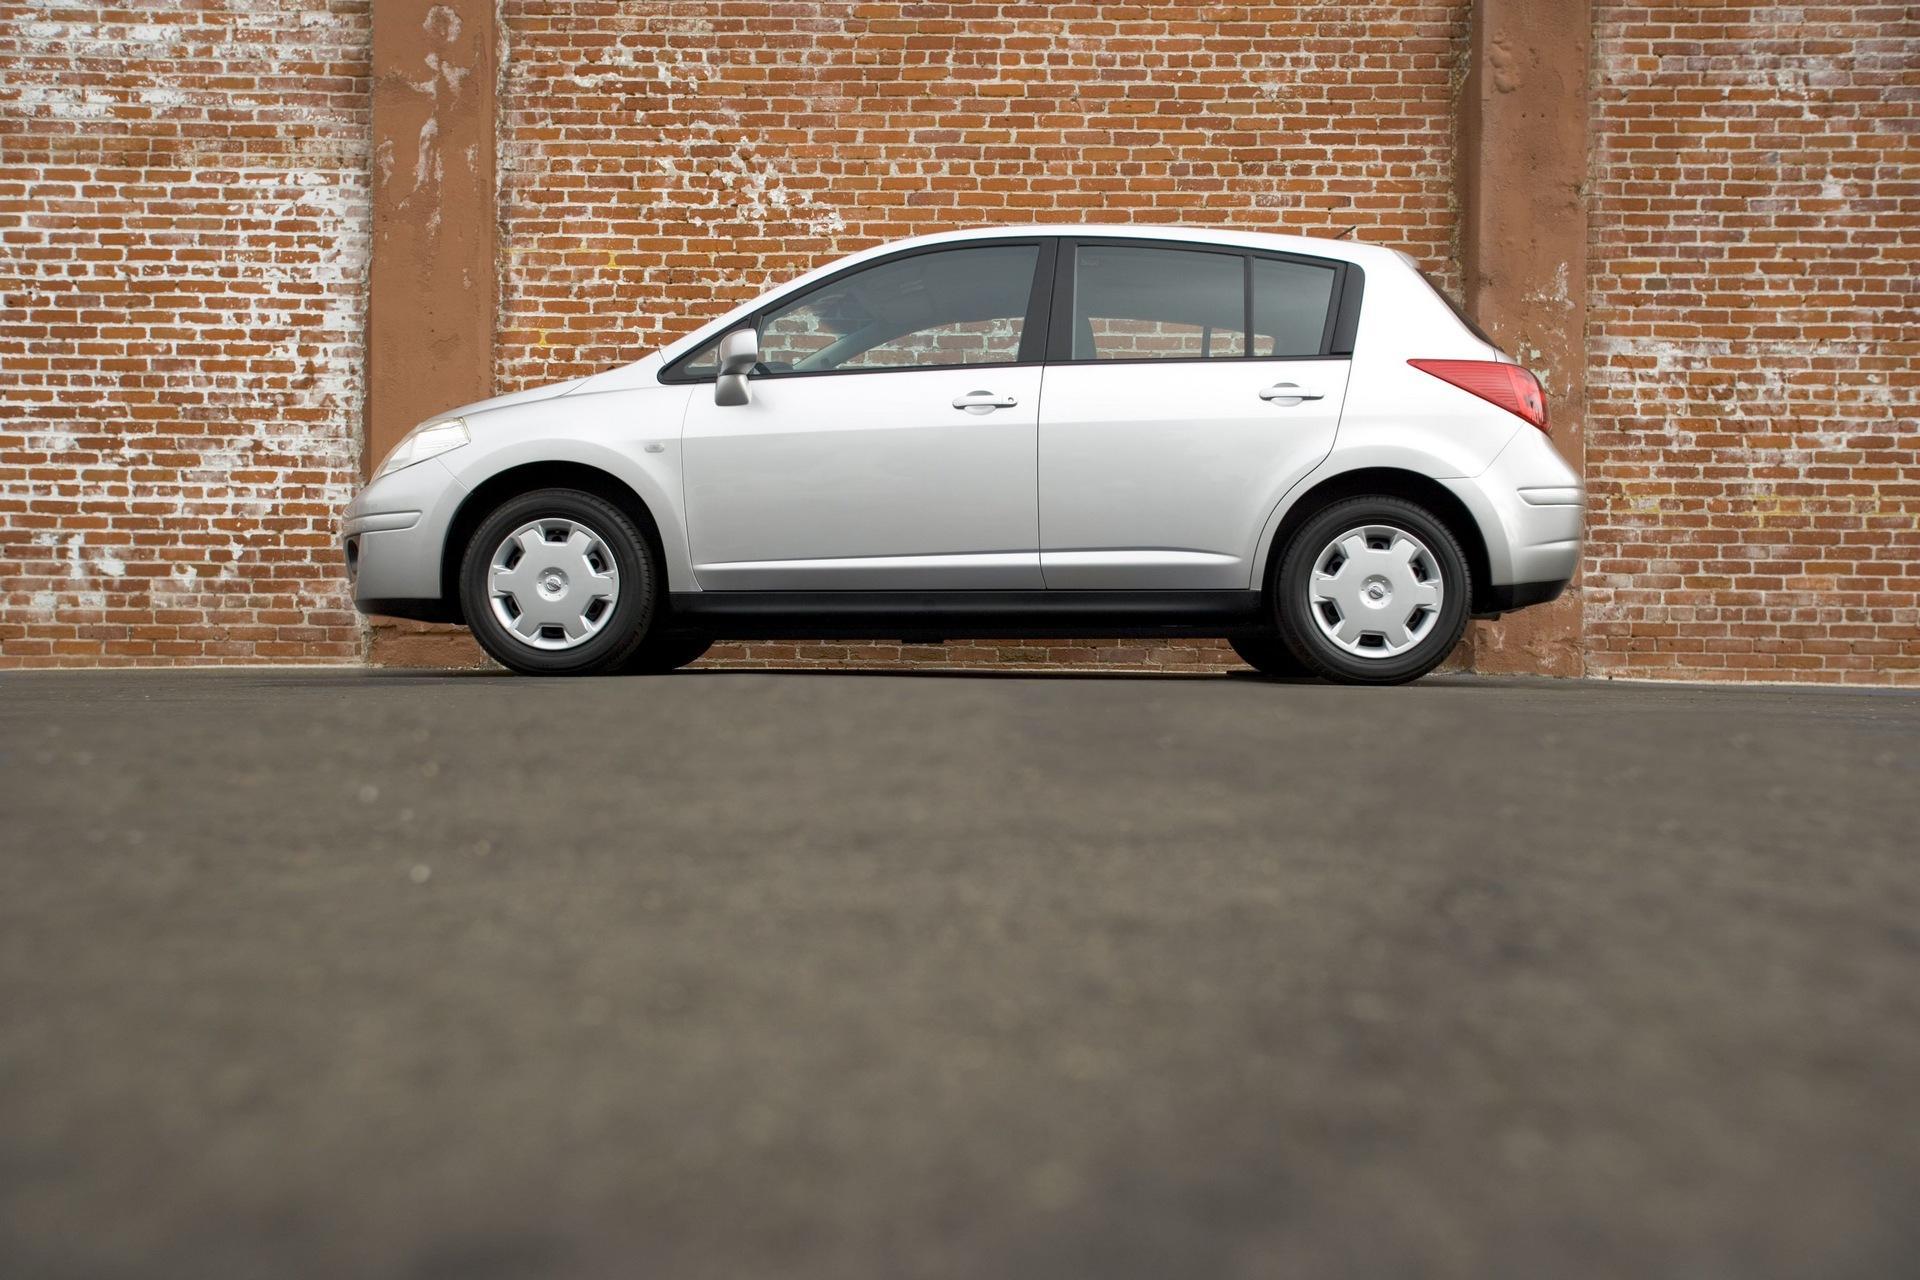 2008 nissan versa news and information conceptcarz com rh conceptcarz com 2008 Nissan Versa Interior Parts 2008 Nissan Versa Engine